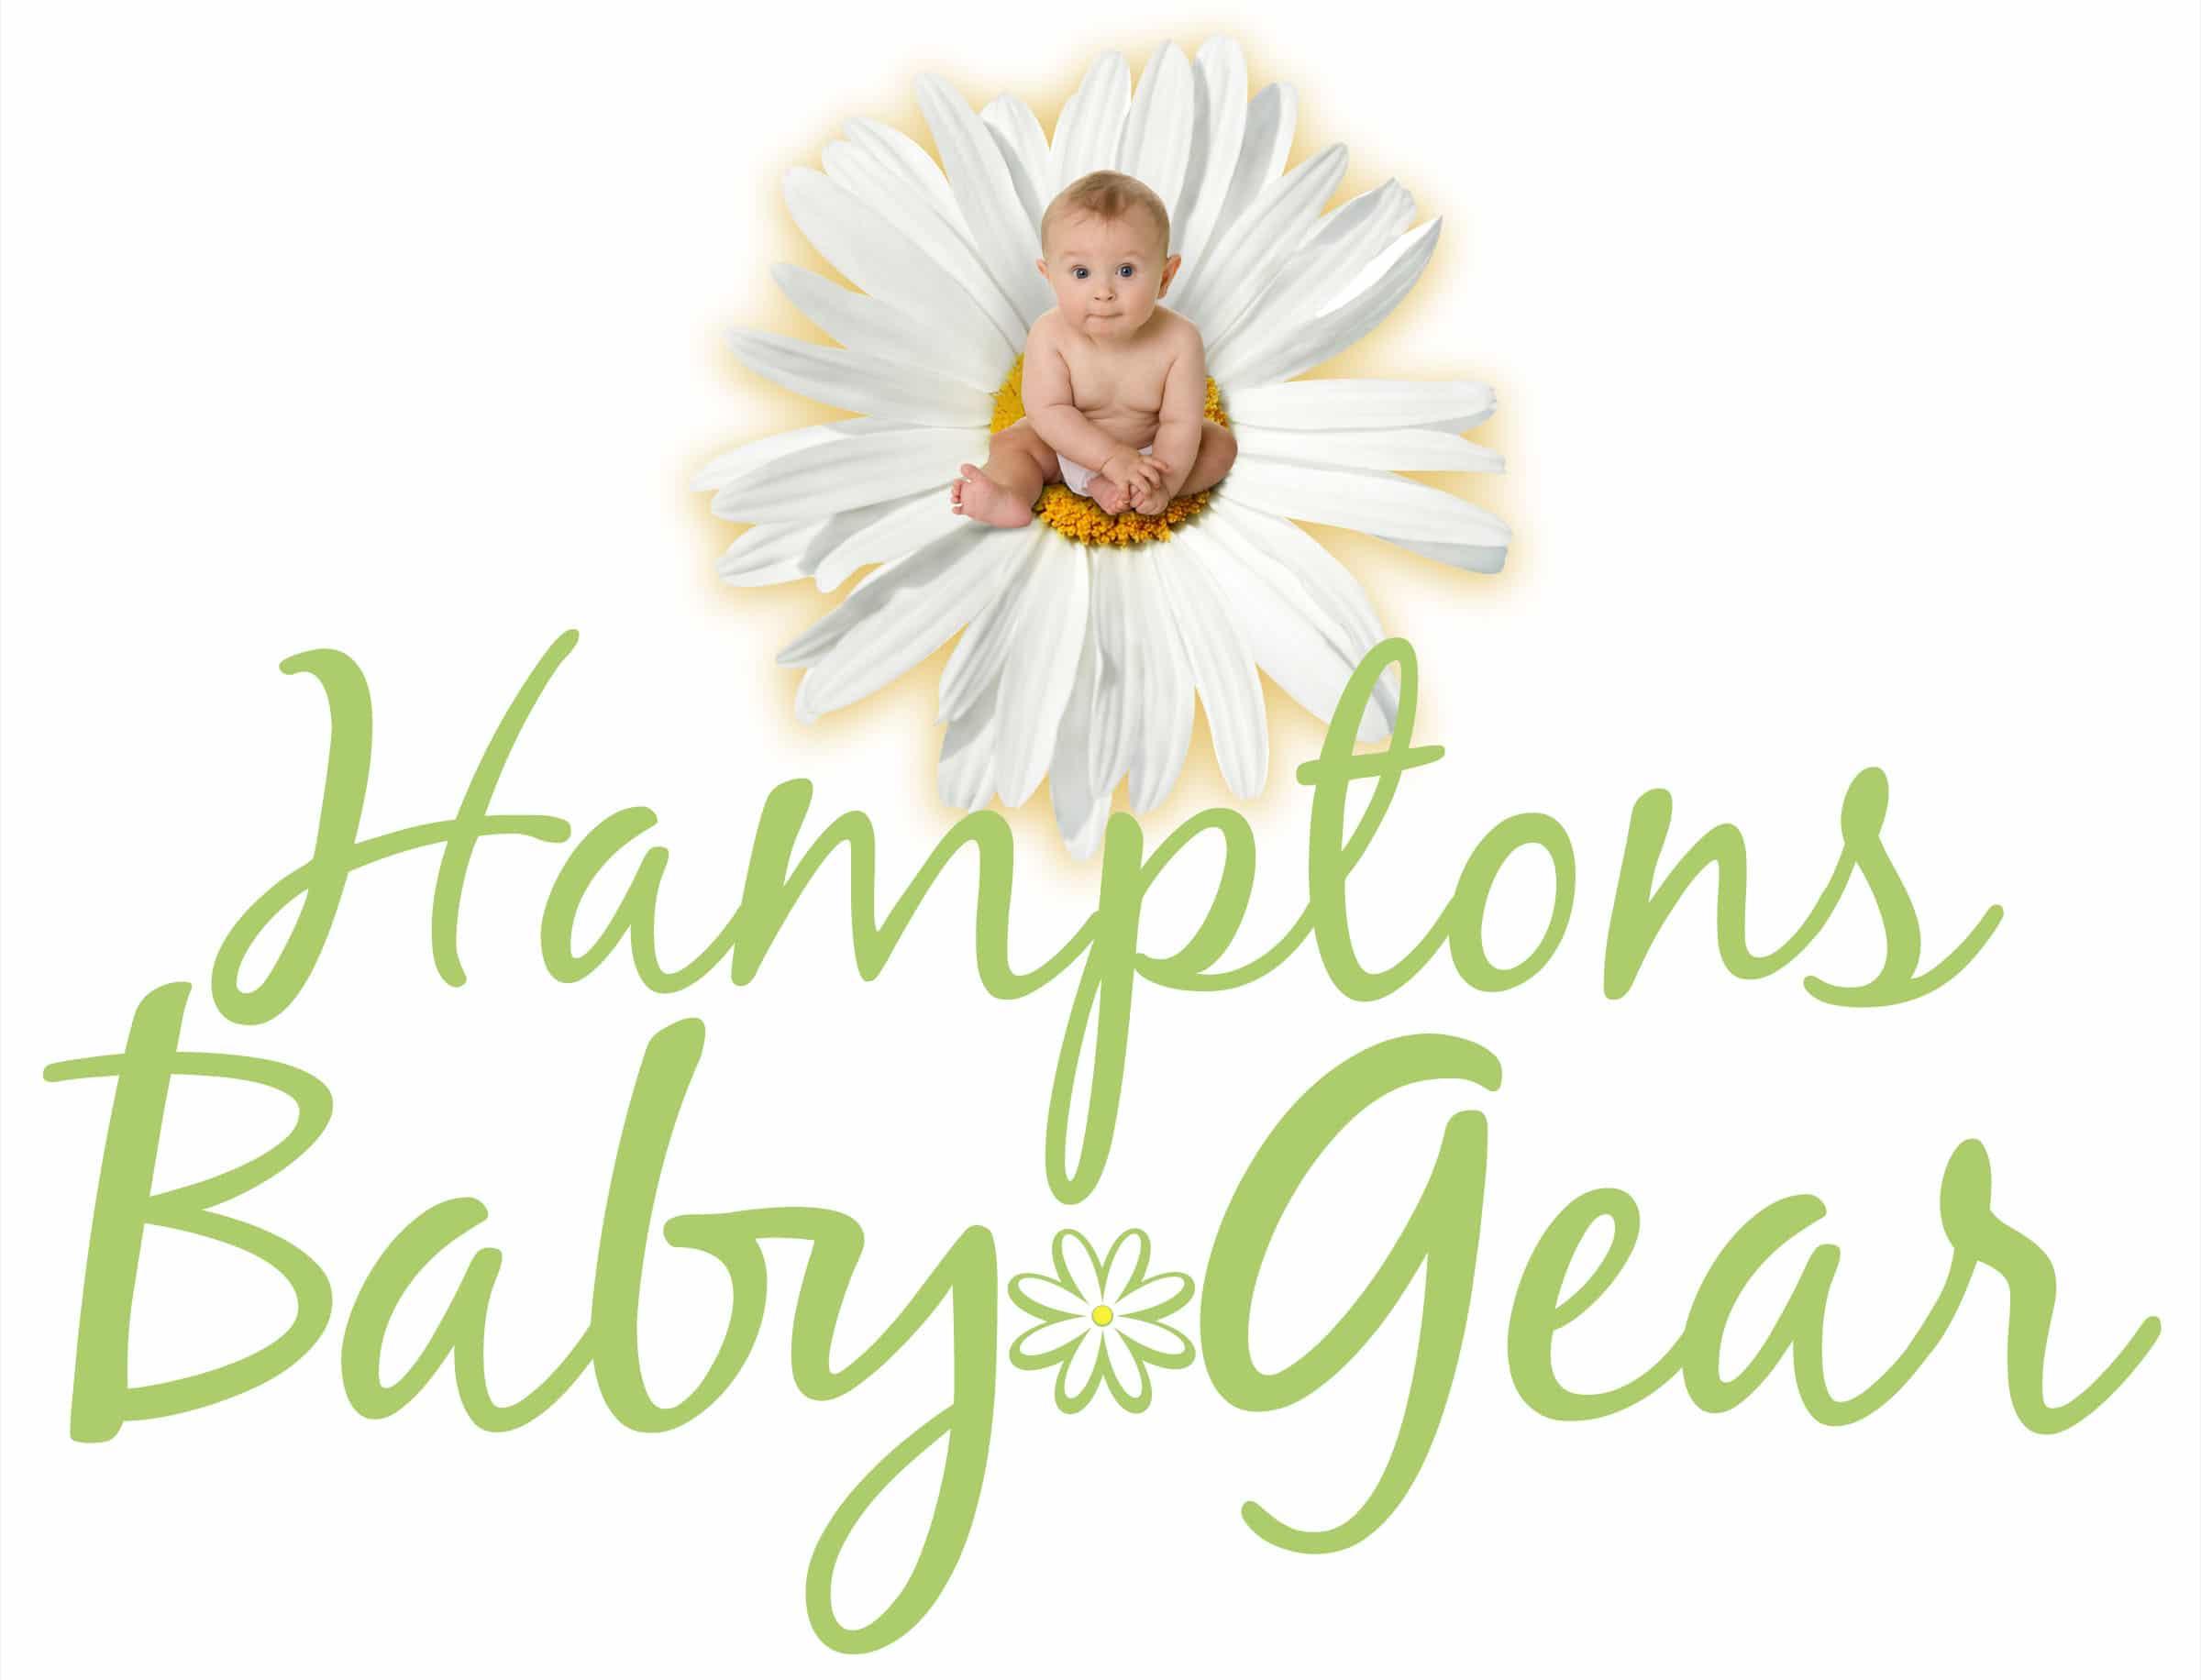 Hampton Baby Gear